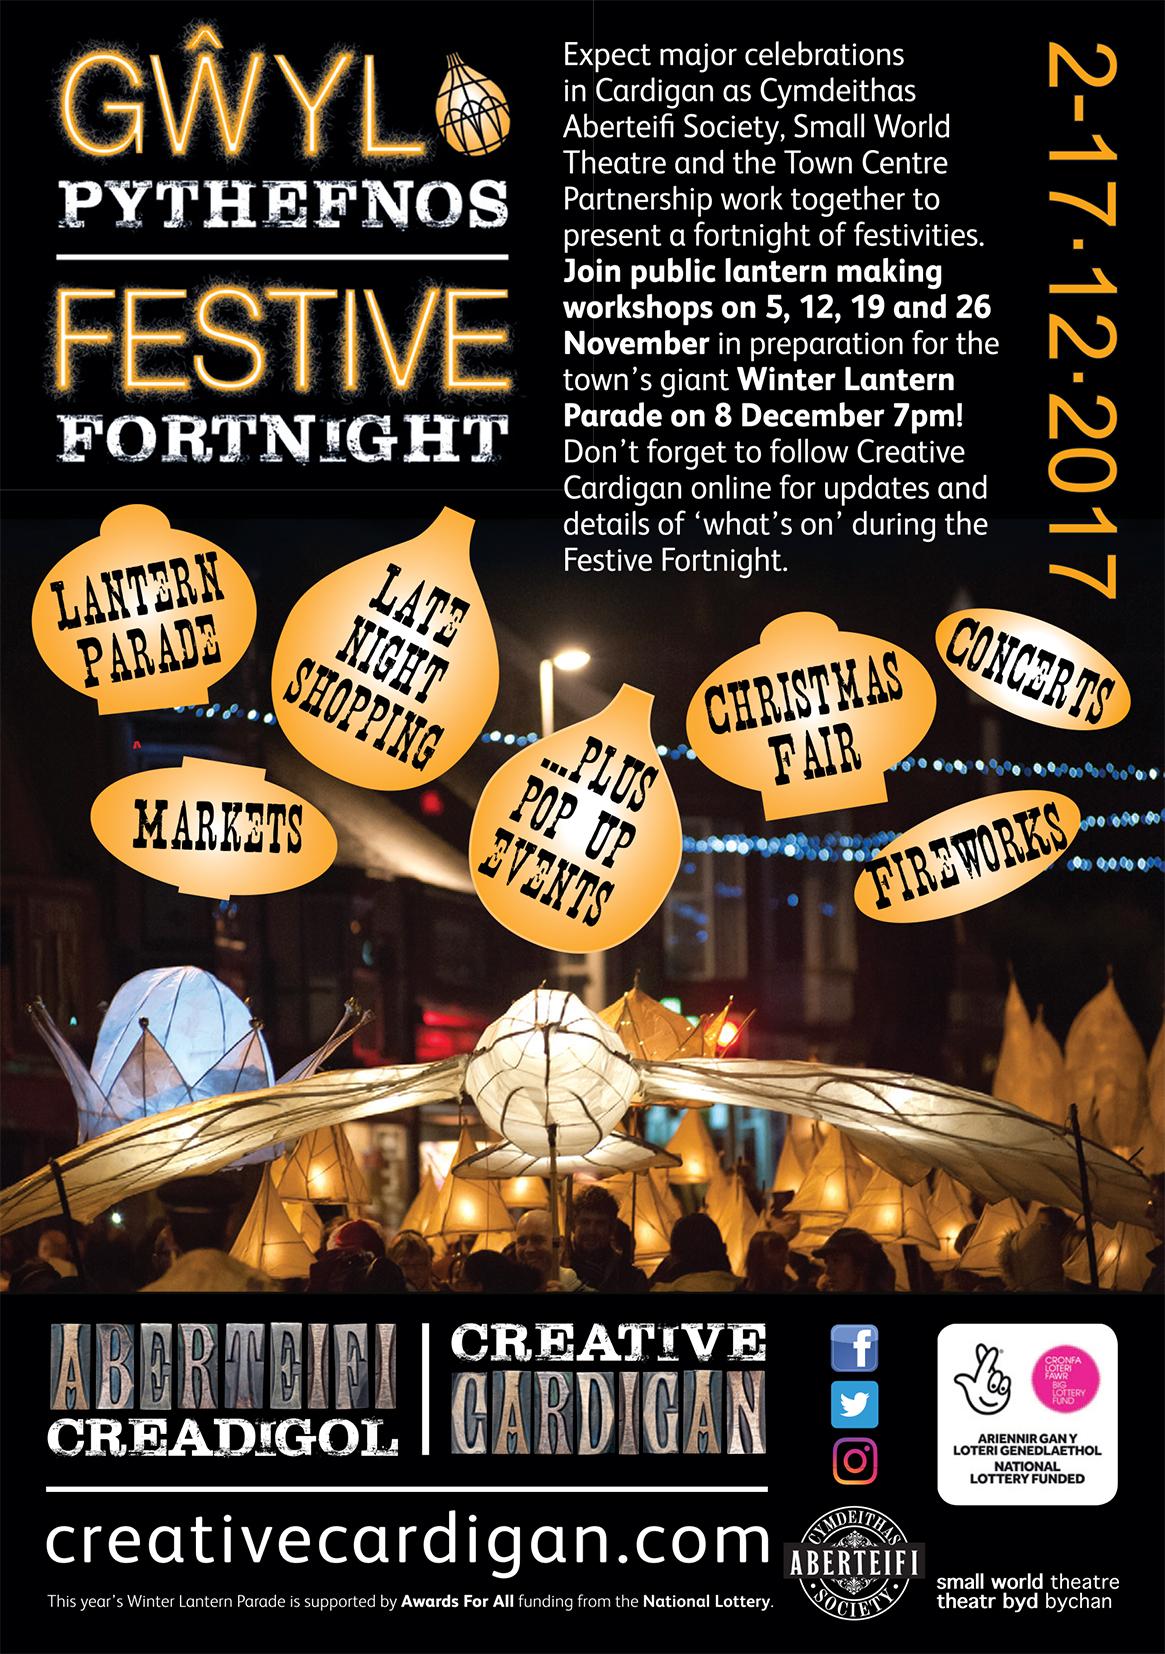 Cardigan Festive Fortnight